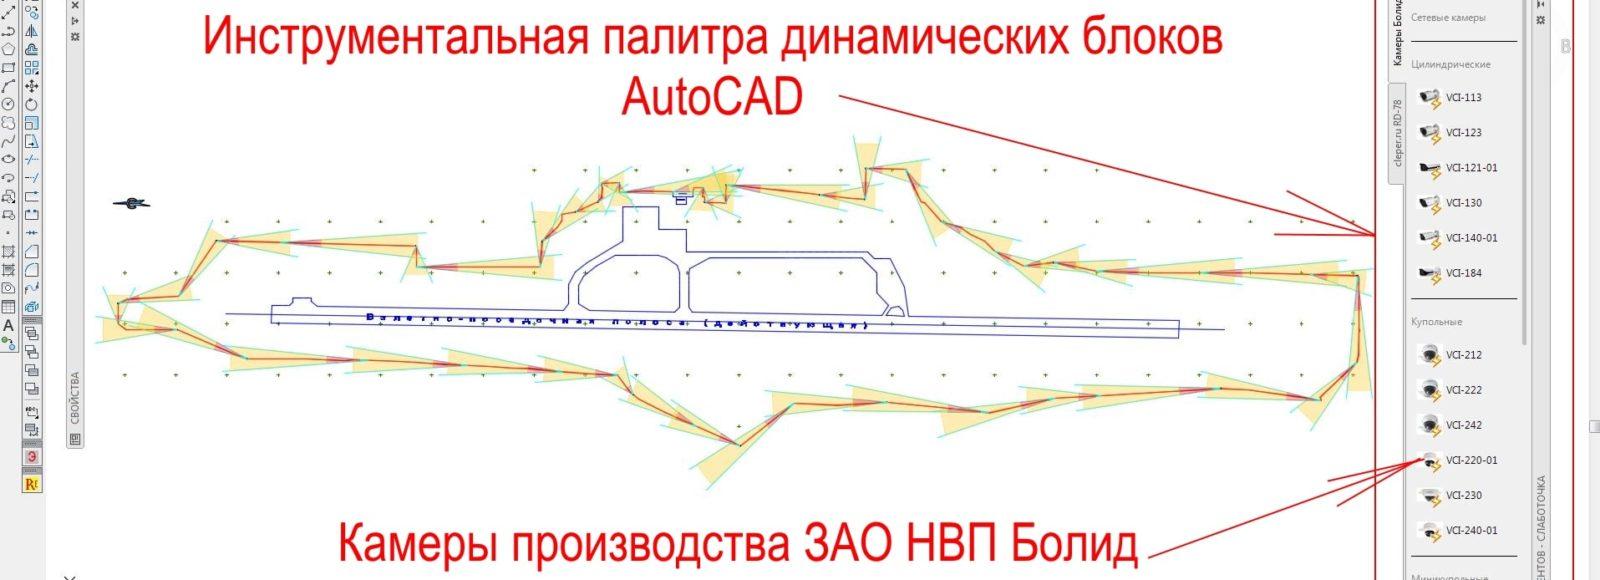 Airport_CCTV_AutoCAD